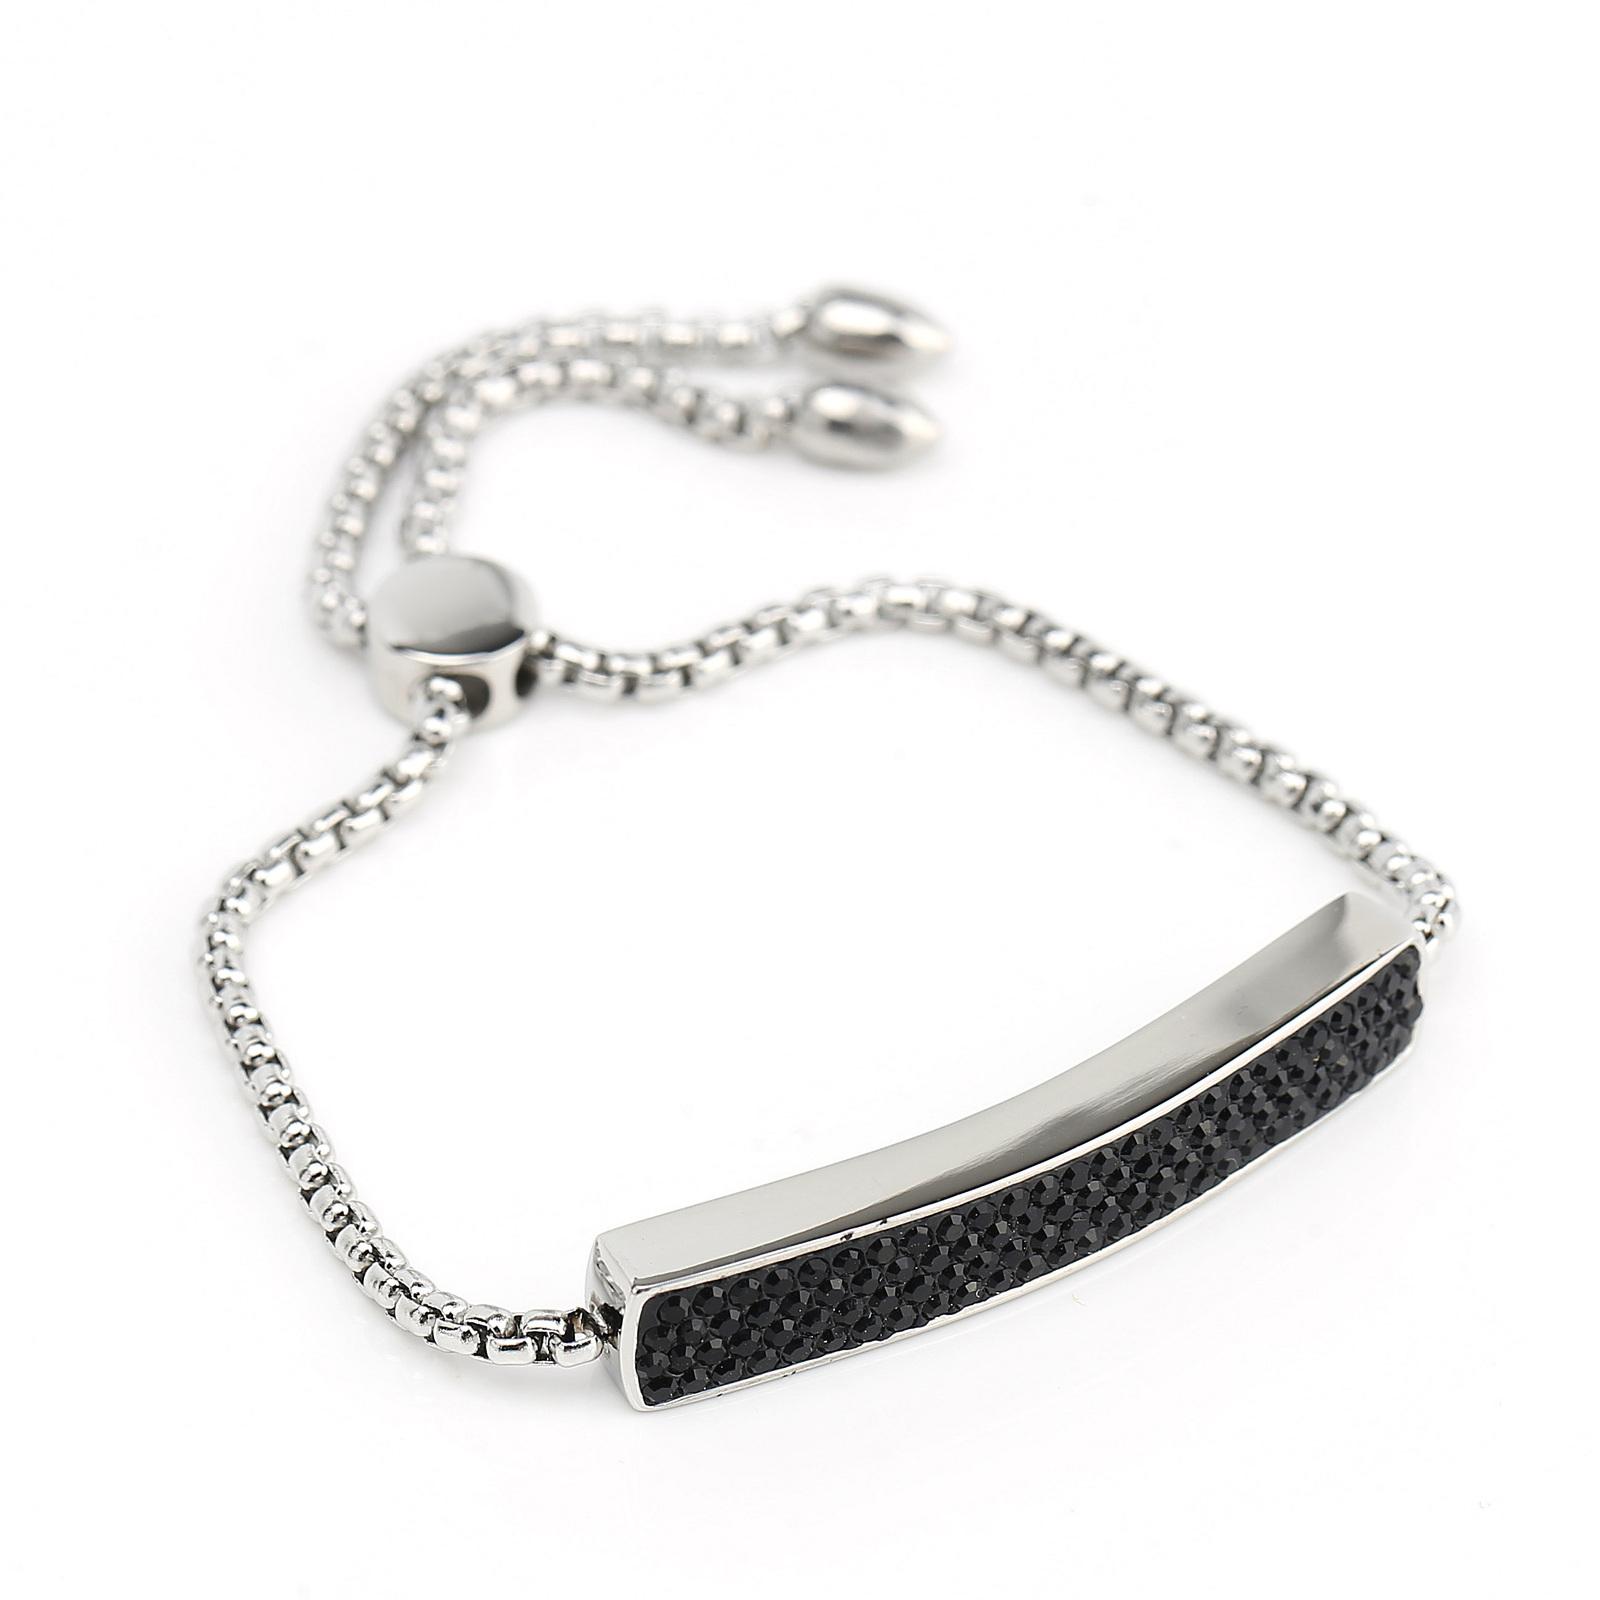 UNITED ELEGANCE Silver Tone Bolo Bar Bracelet, Black Swarovski Style Crystals